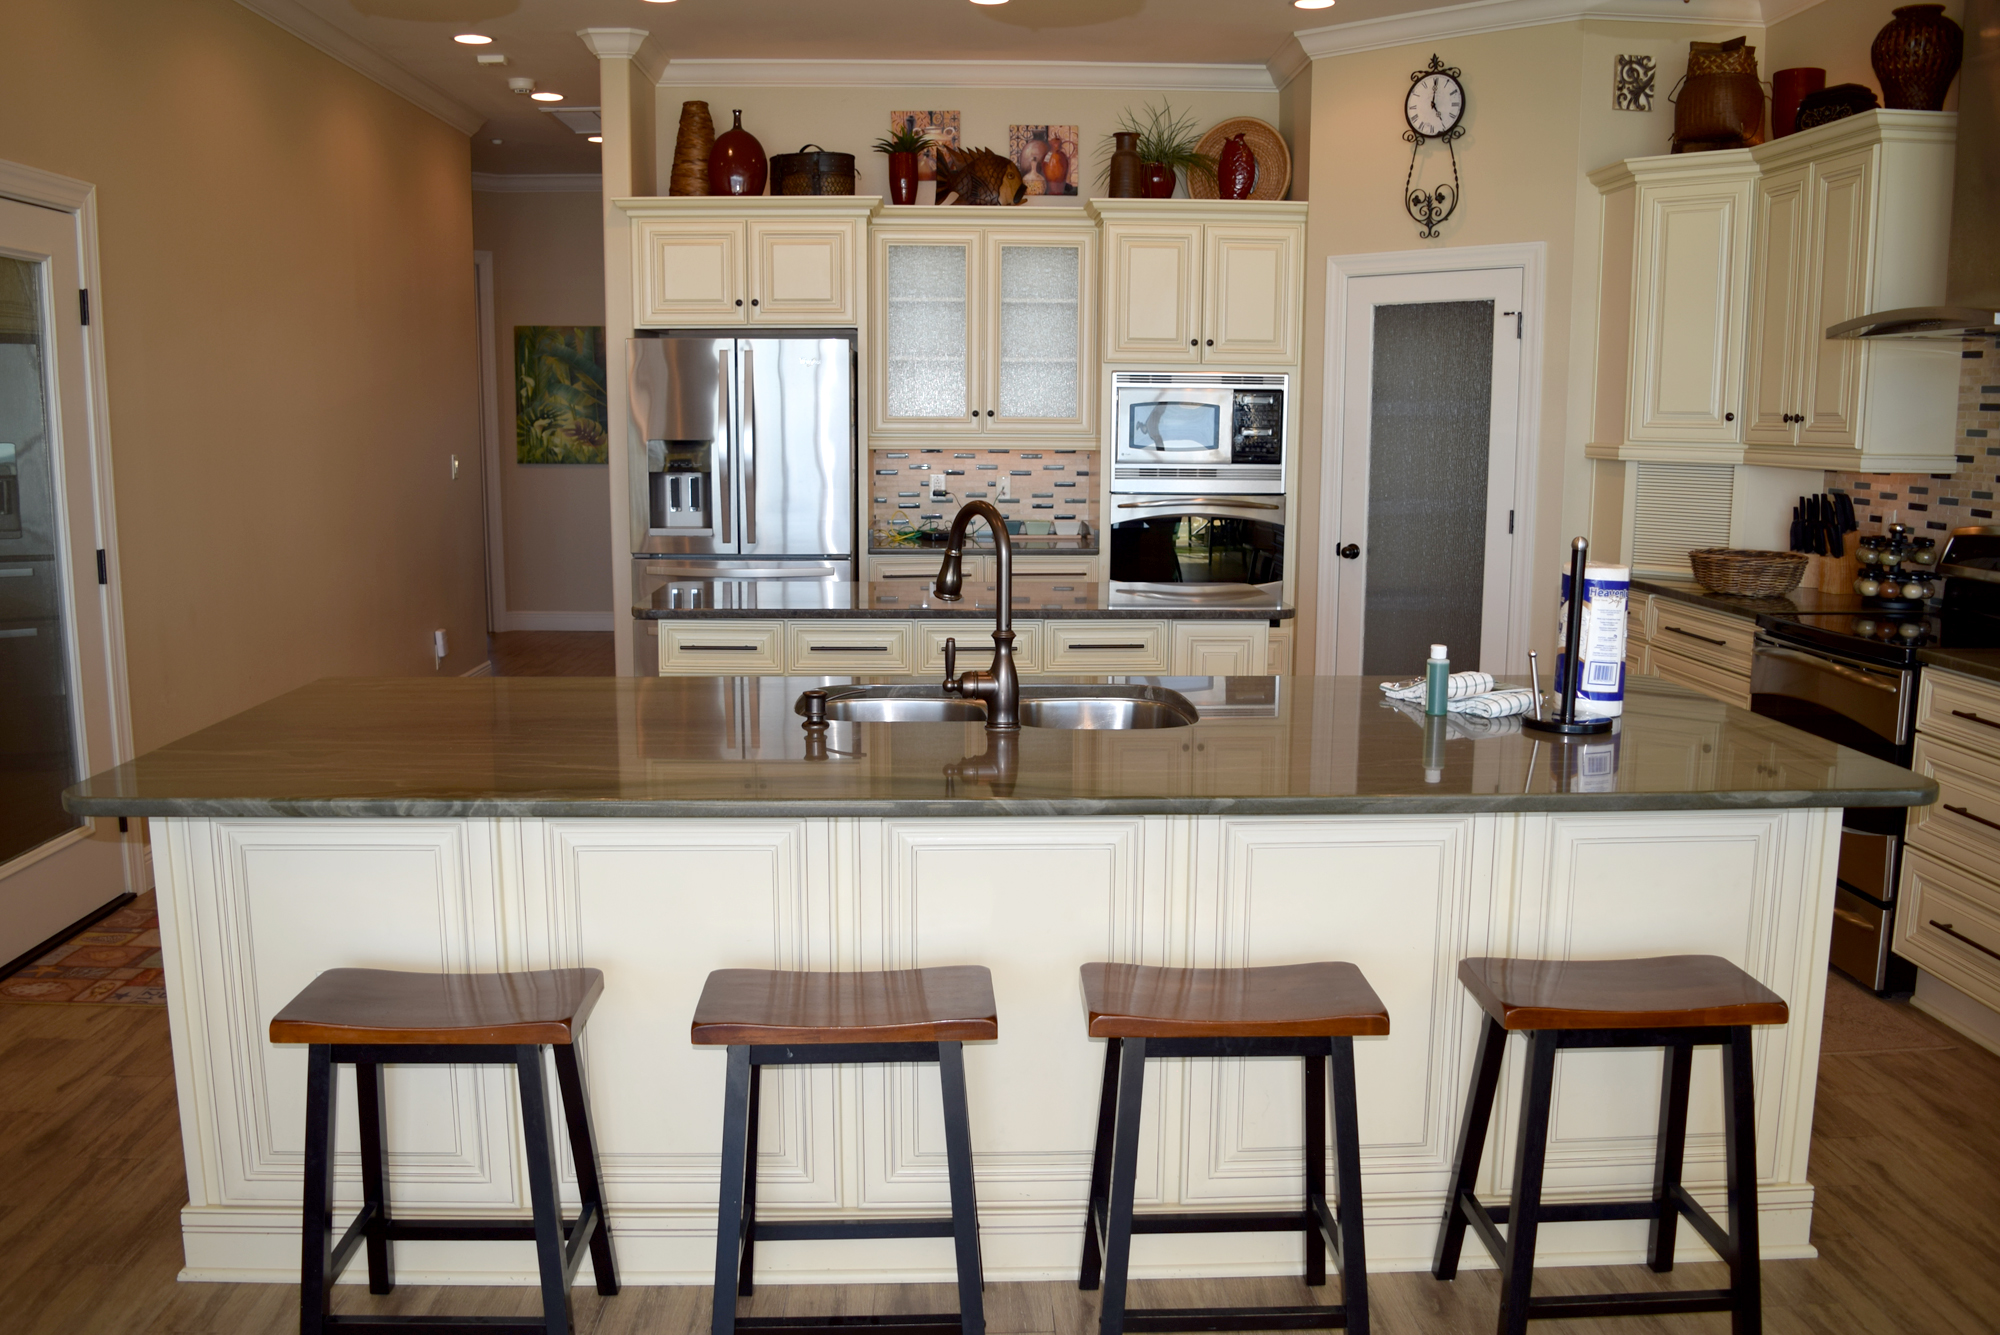 Regency Cabanas #B1 Condo rental in Regency Cabanas Pensacola Beach in Pensacola Beach Florida - #4